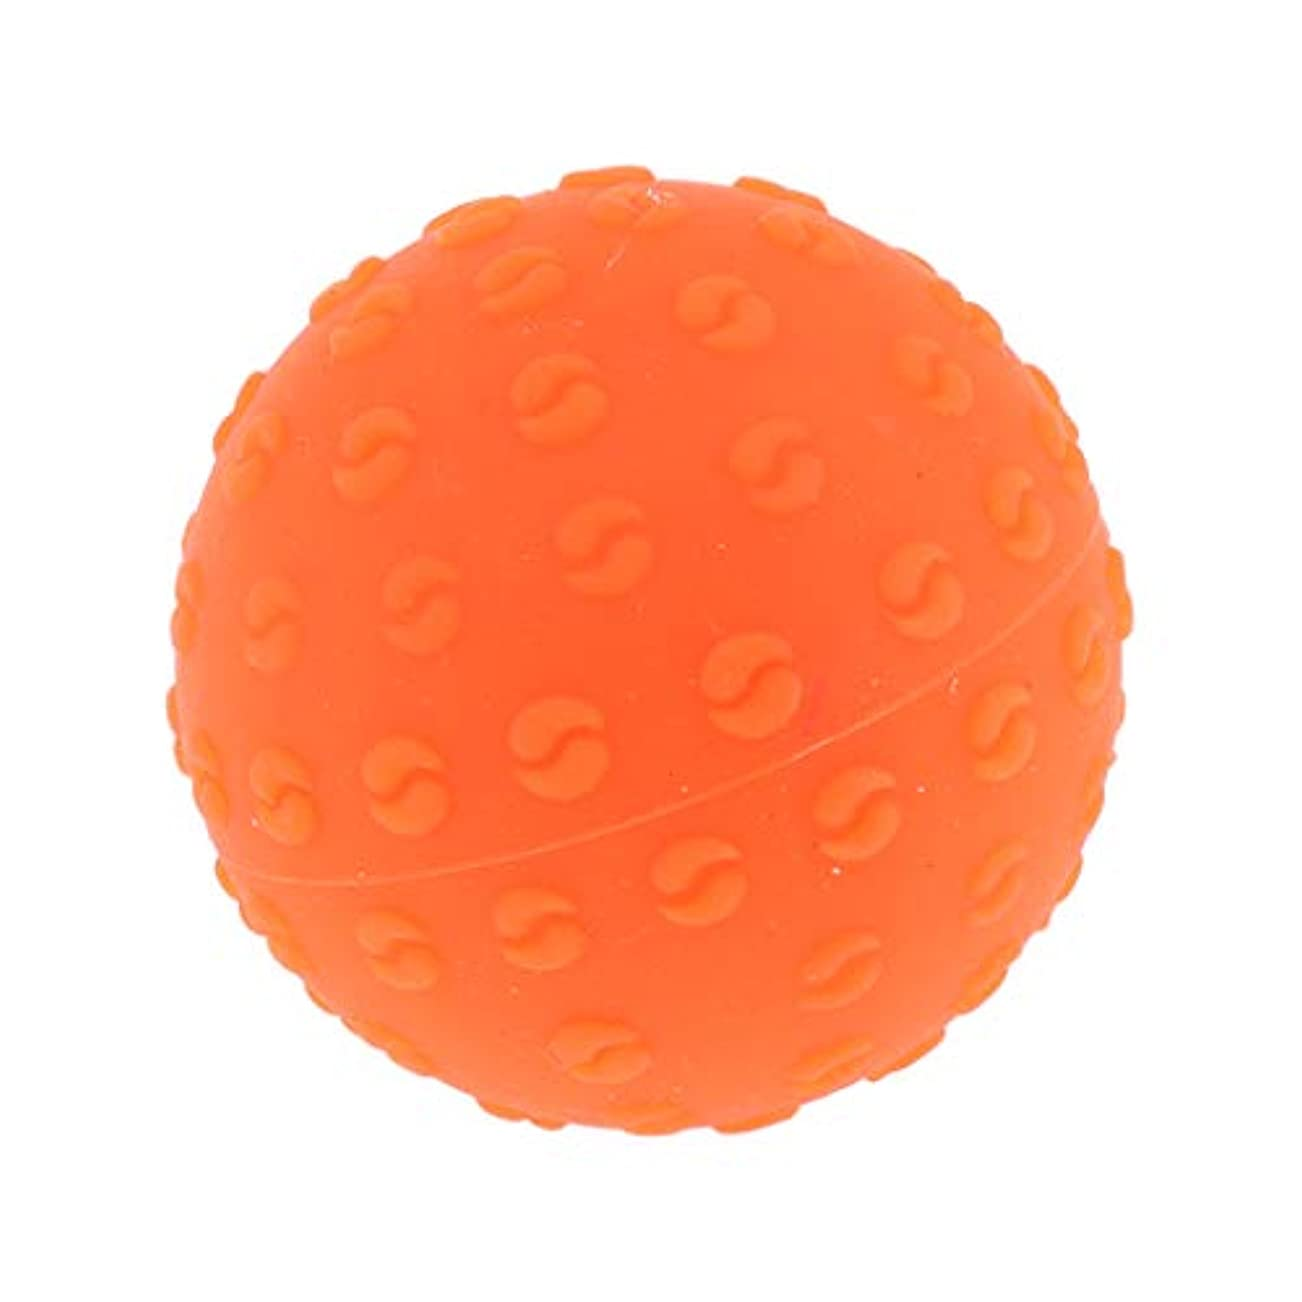 Perfeclan 全6色 マッサージボール 指圧ボール シリコーン トリガーポイント 足底筋膜炎 ヨガ 耐油性 快適 - オレンジ, 説明のとおり